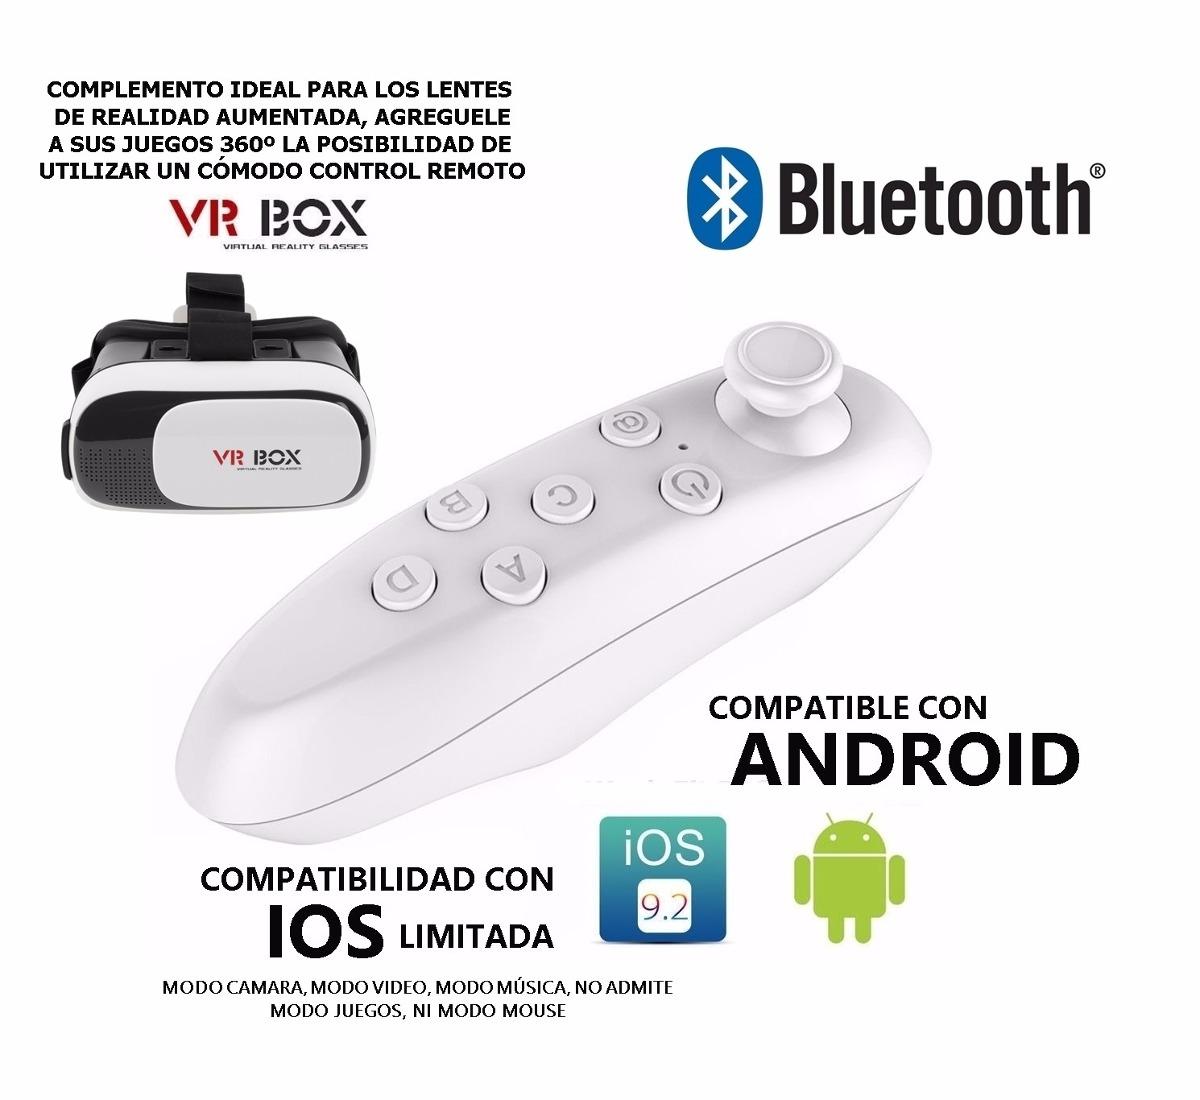 Joystick Vr Box Gamepad Bluetooth Control Remoto Rosario 400 00